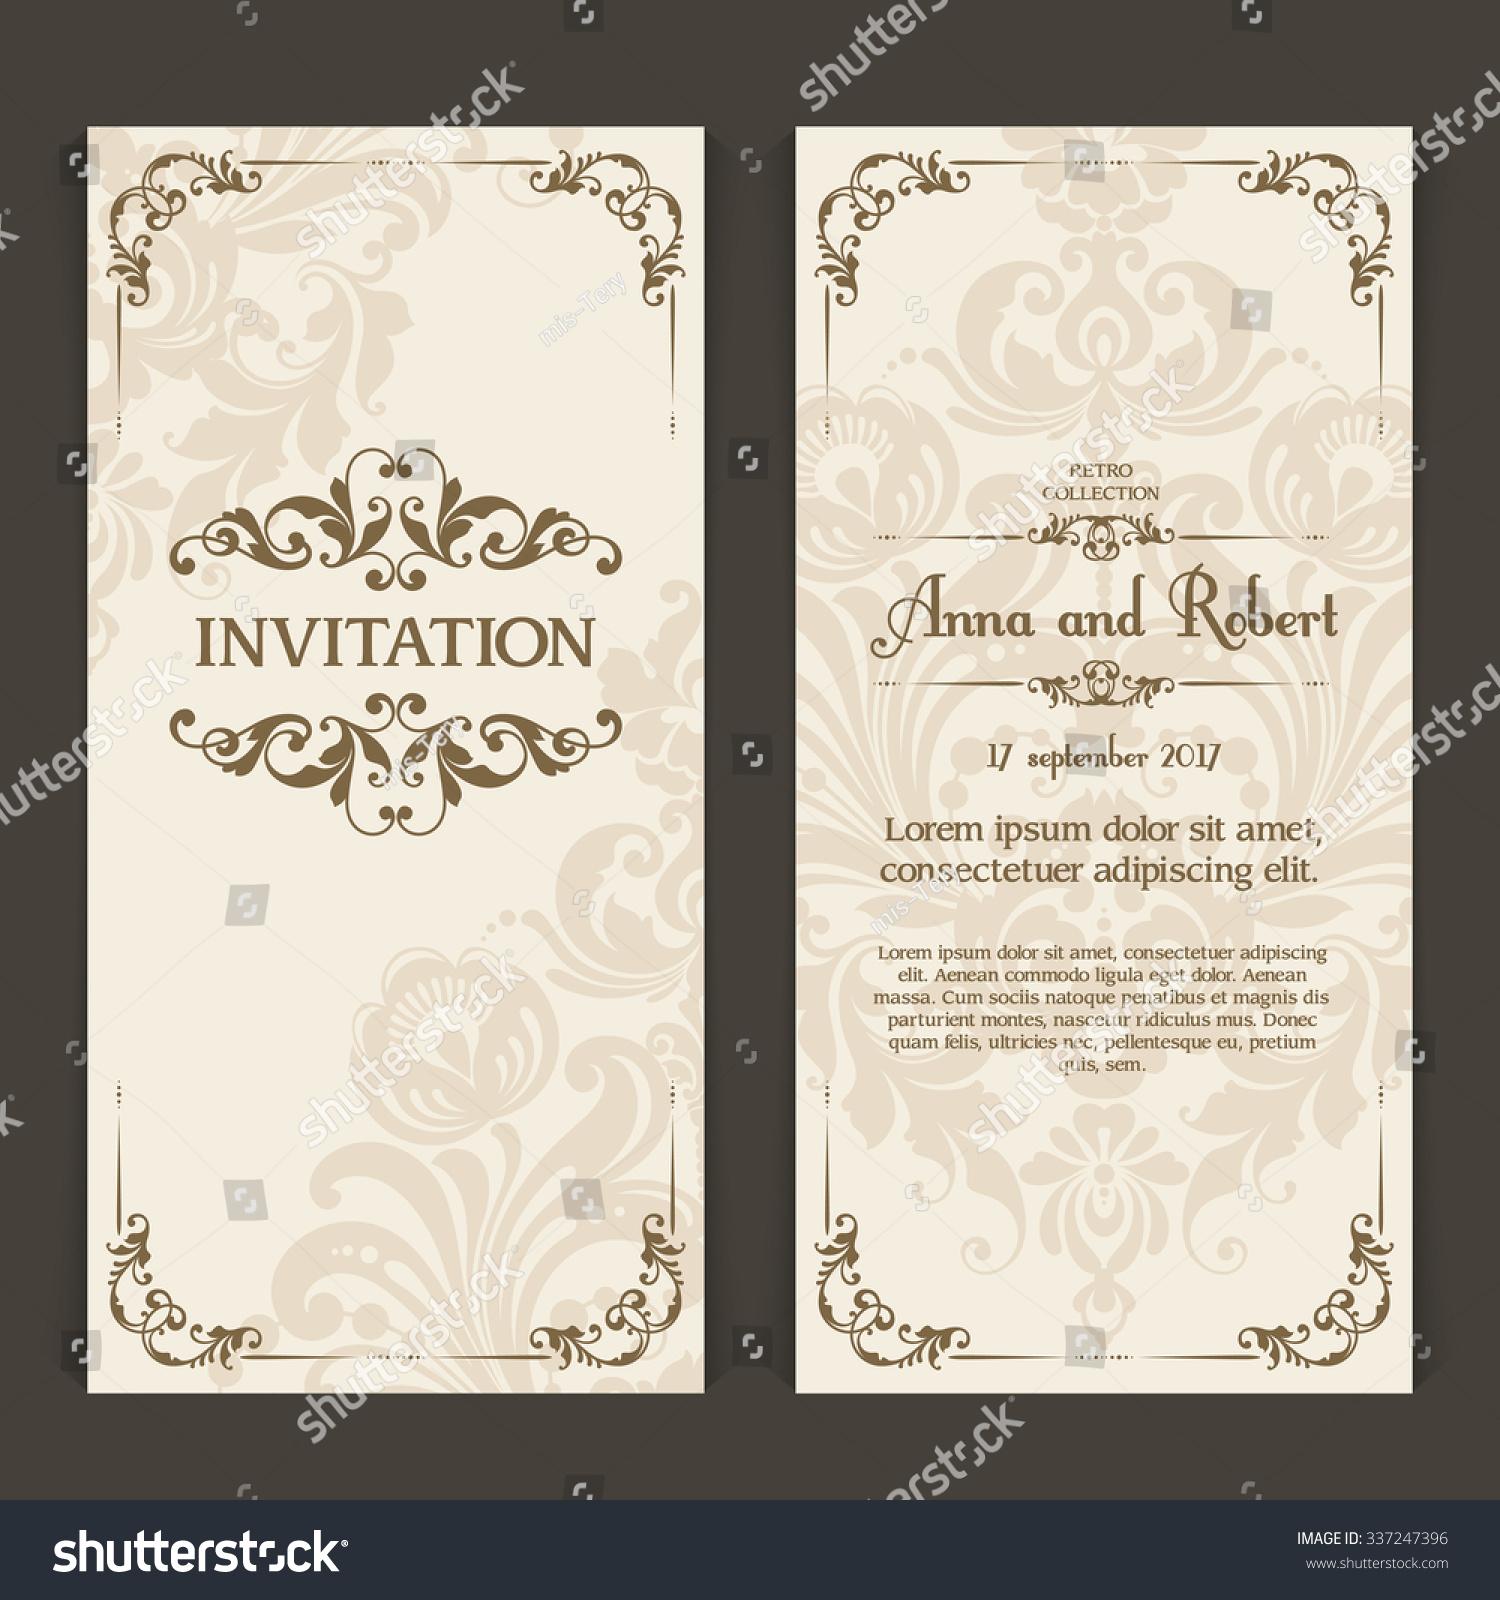 Elegant vintage wedding invitation design vector stock vector elegant vintage wedding invitation design vector set of vertical banners with ornamental frame and patterned stopboris Image collections